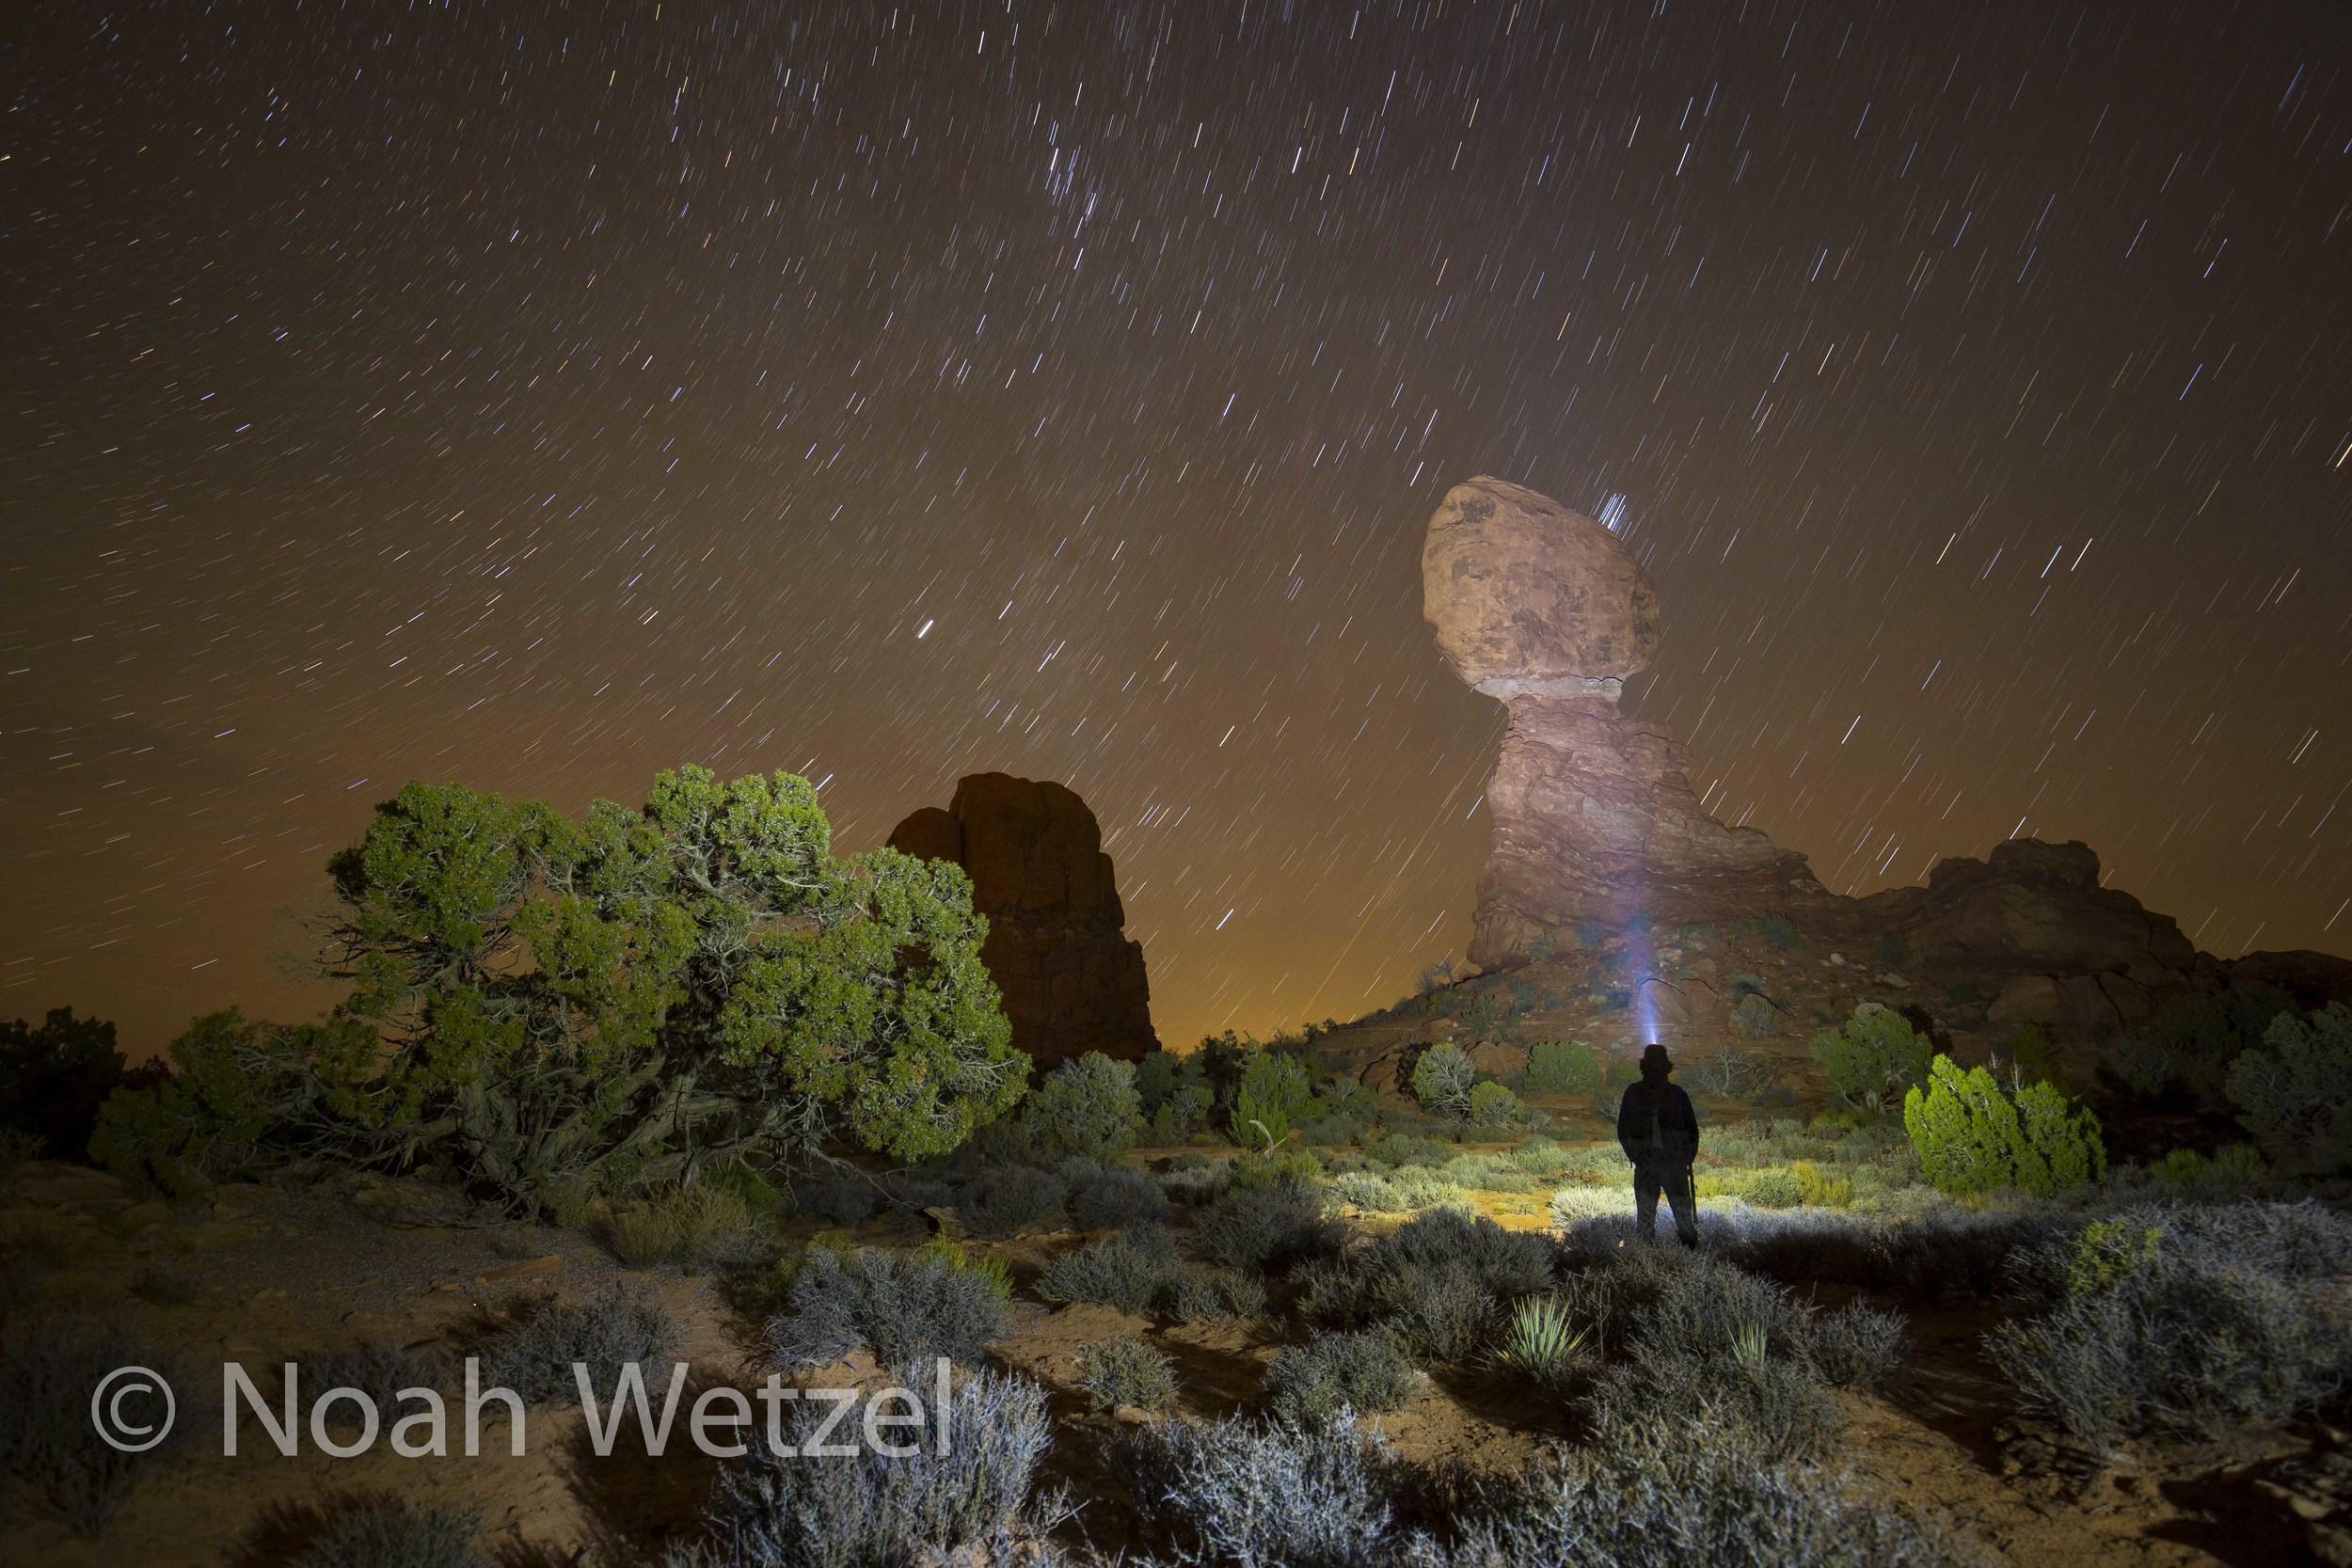 Self Portrait, Balanced Rock, Arches National Park, Moab, Utah